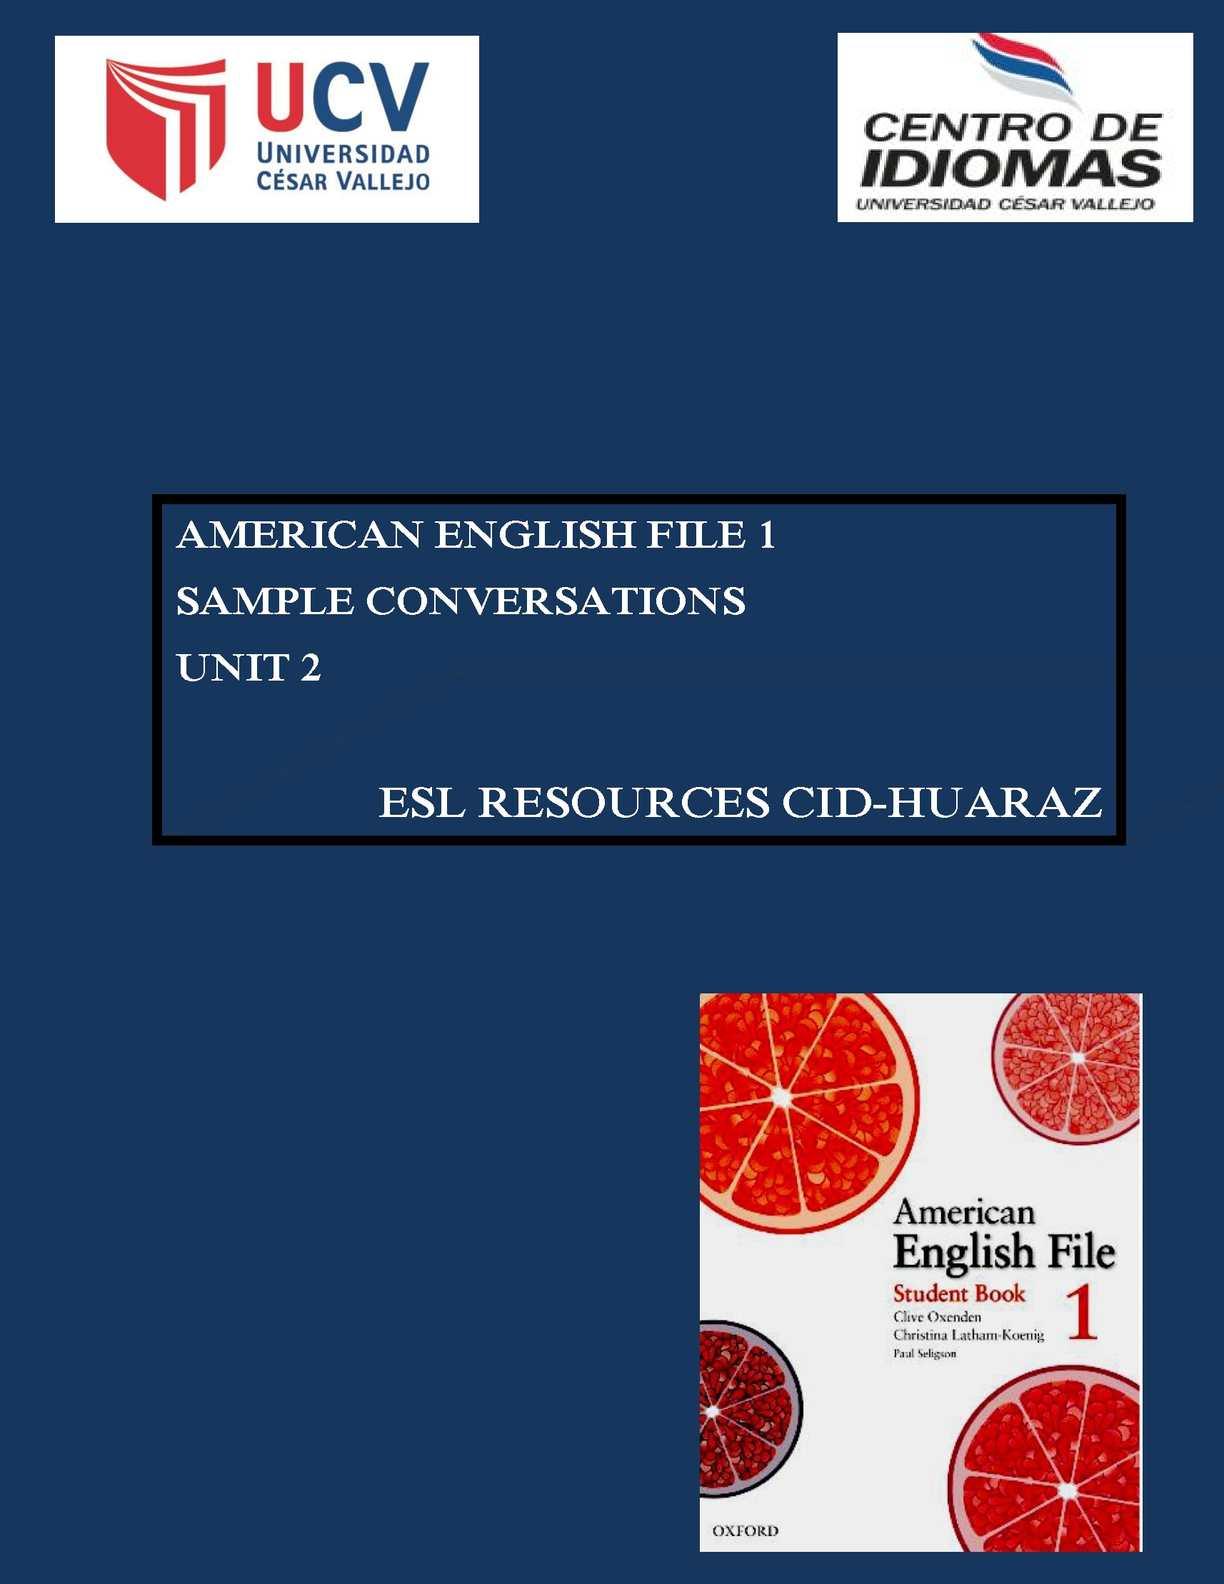 American English File 1 Student Book Gratis